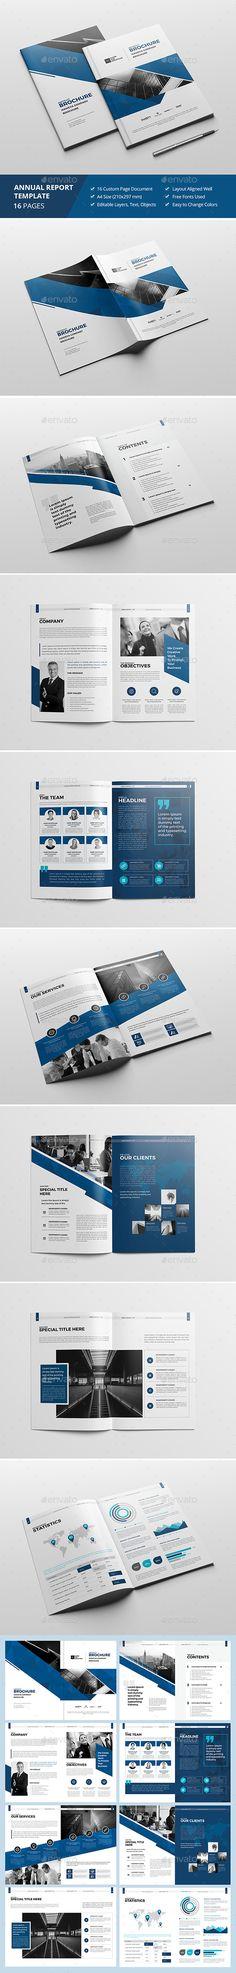 Haweya Annual Report Brochure Template InDesign INDD